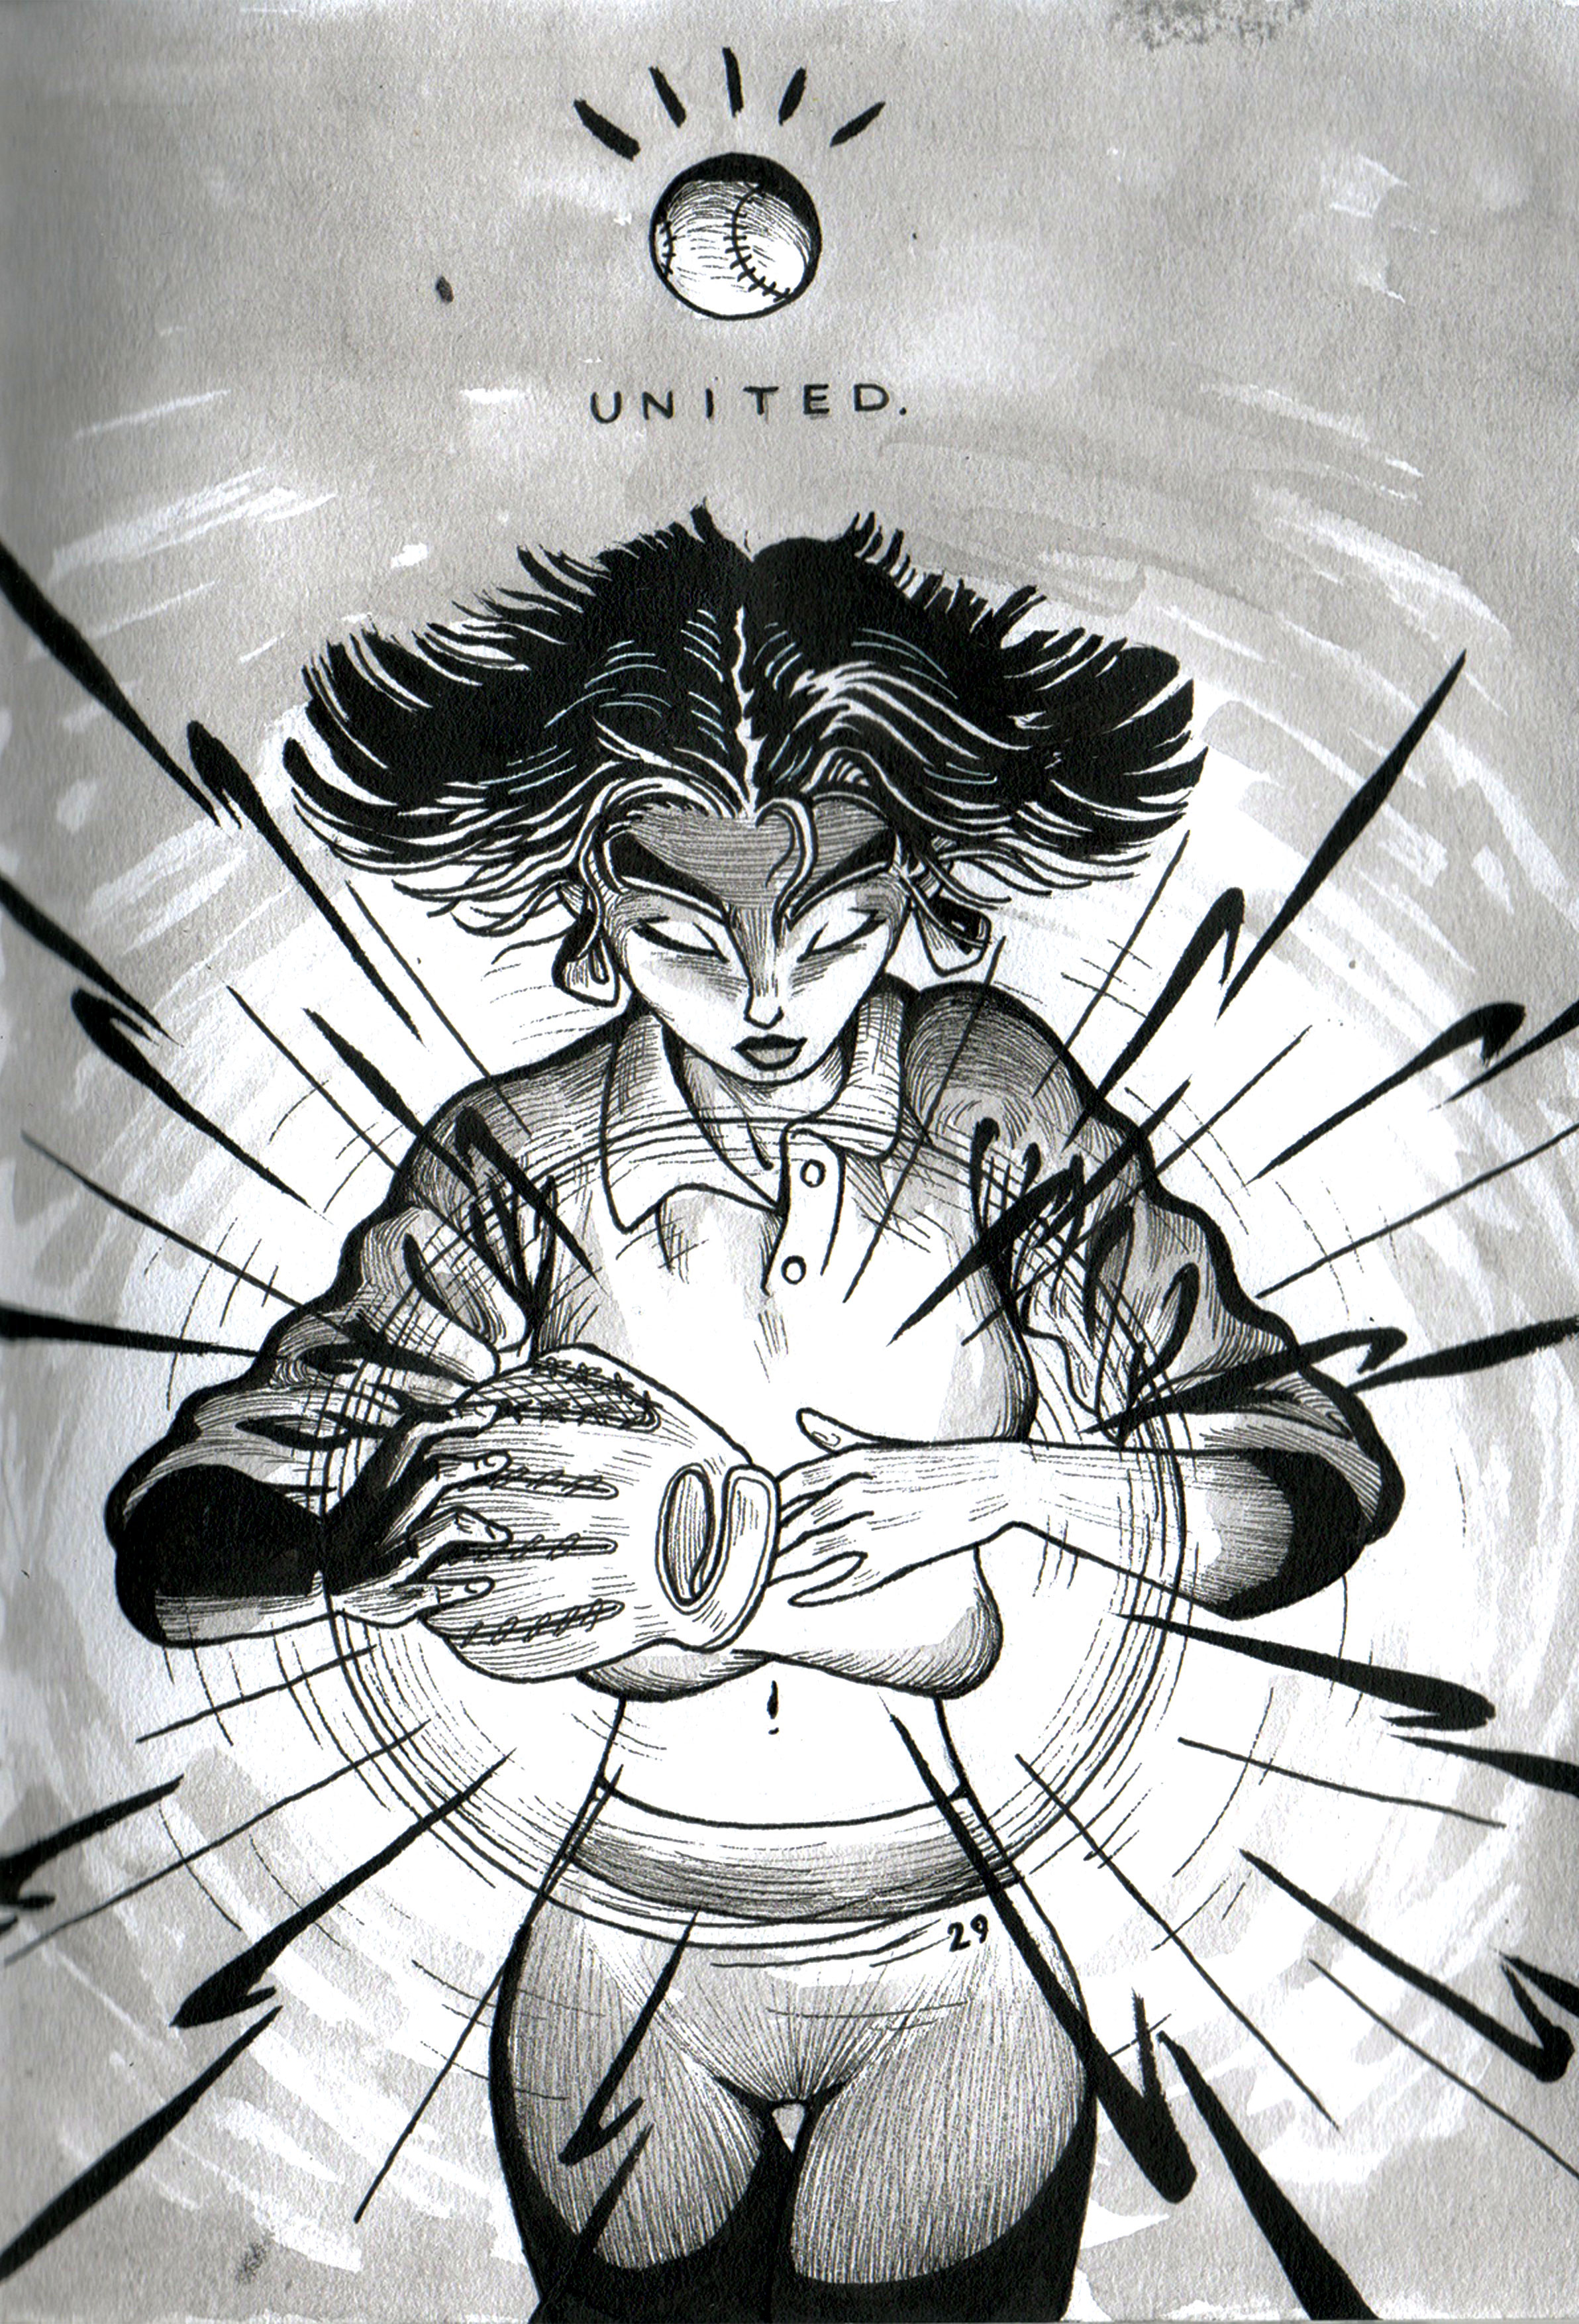 Inktober 2018 - united